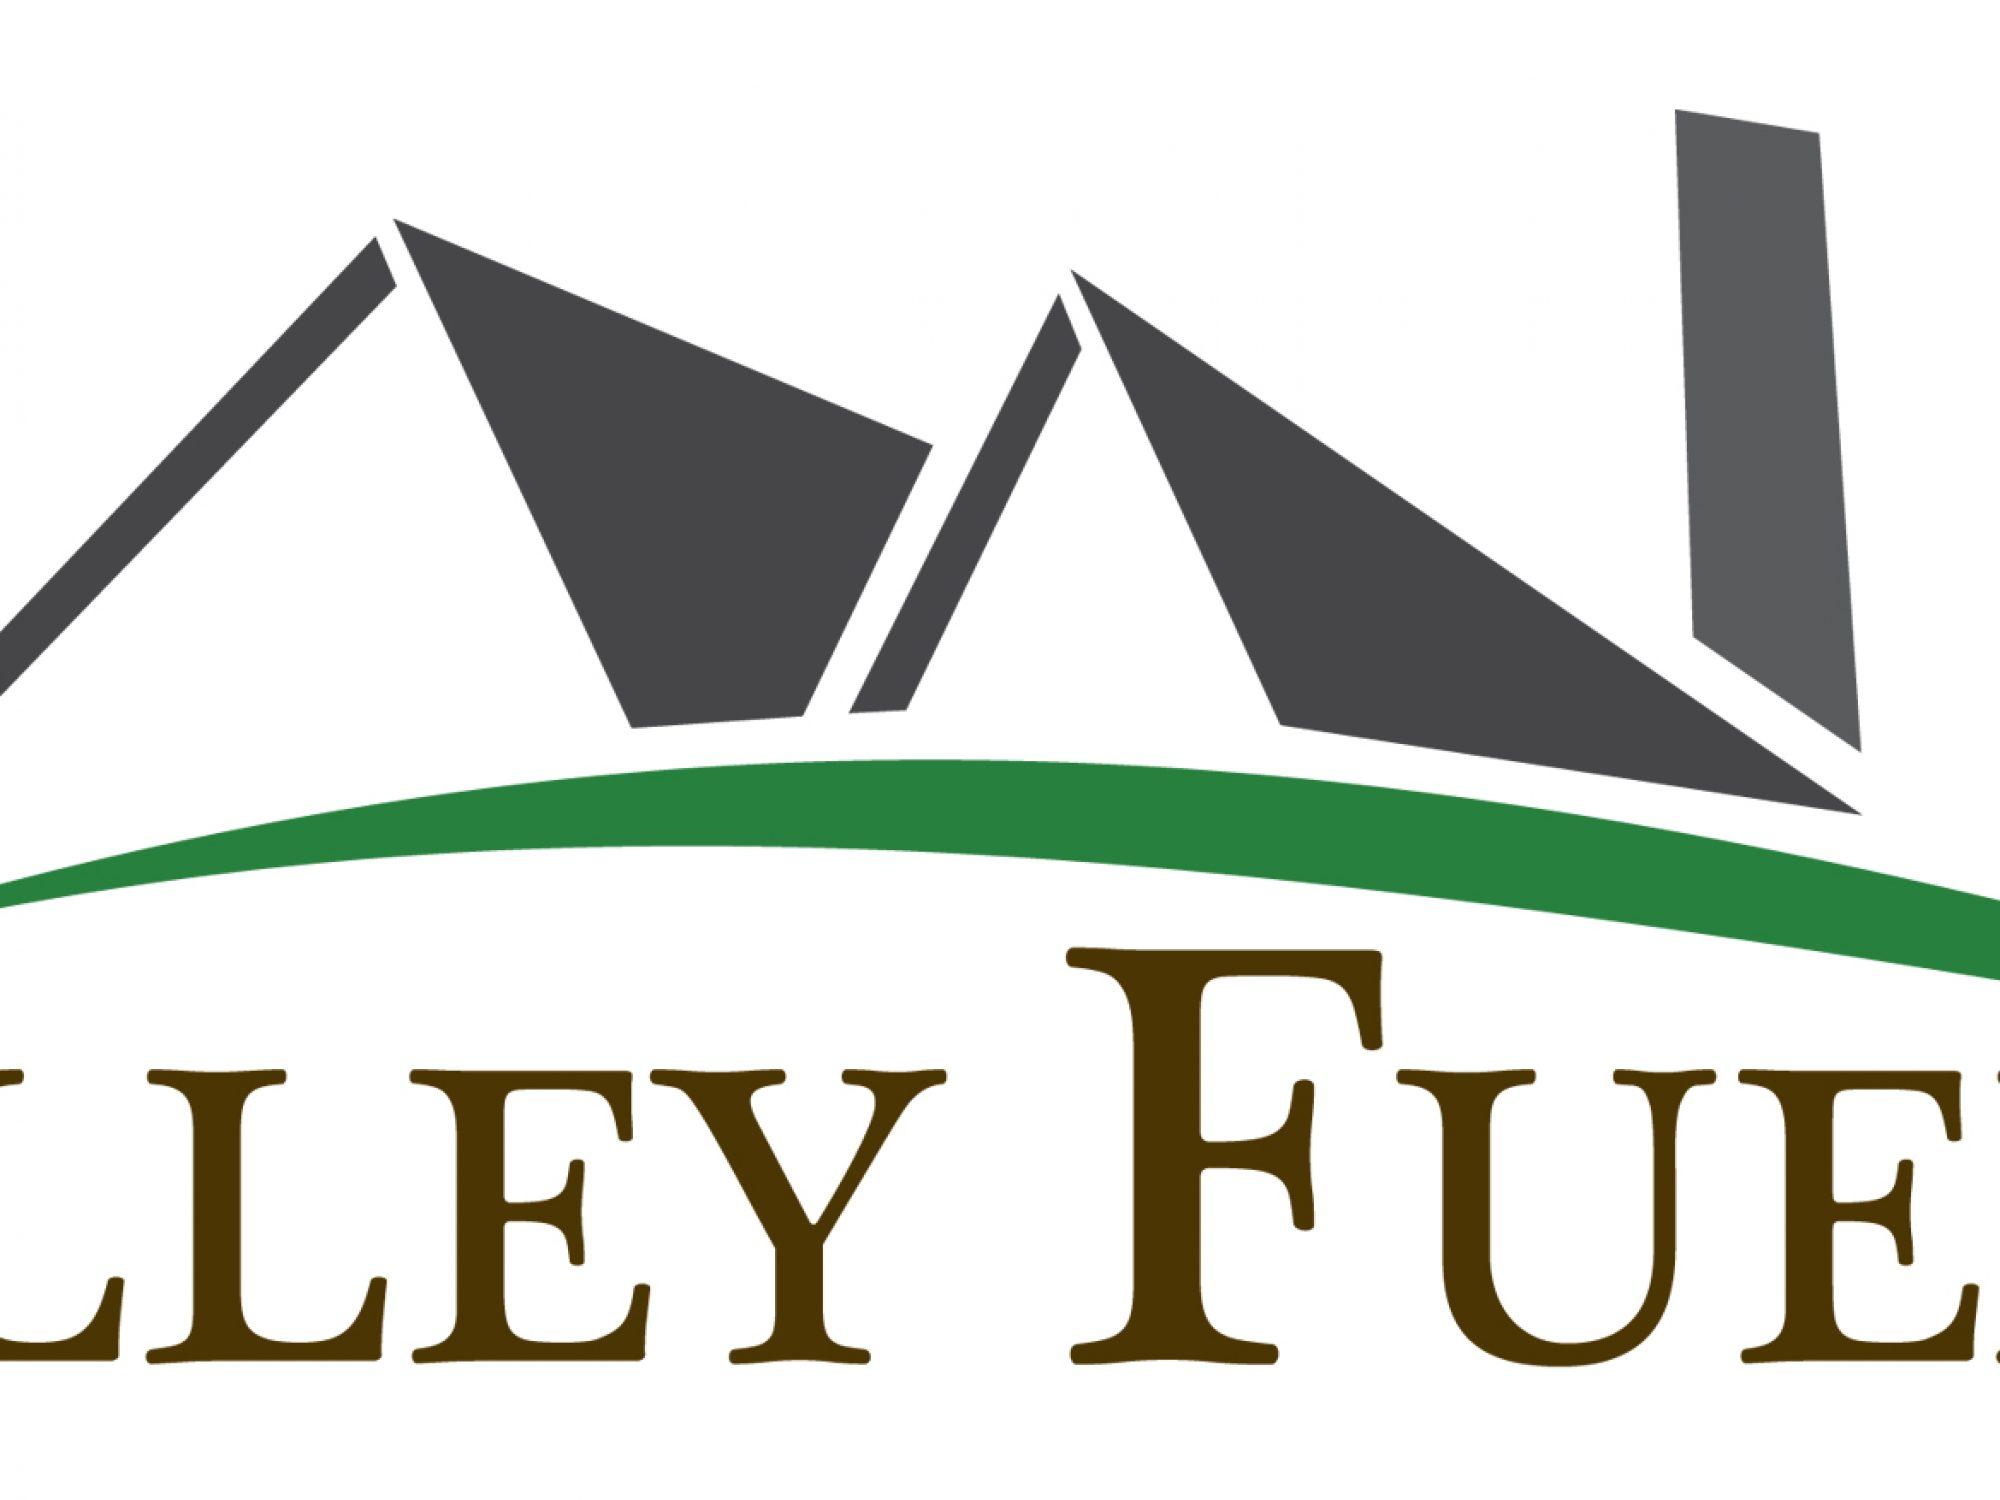 Logo for fuel company